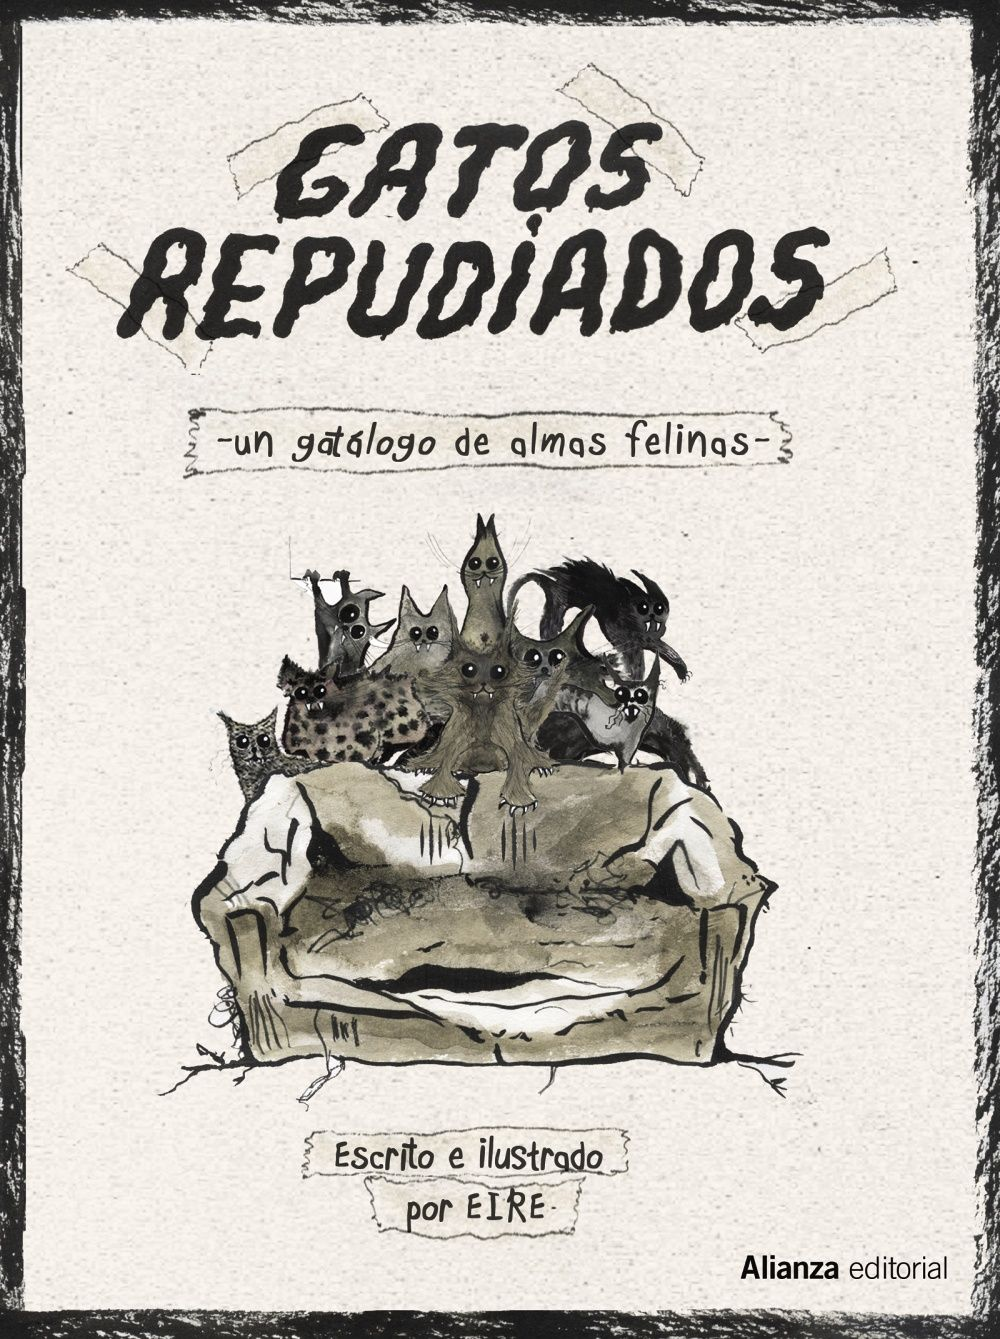 GATOS REPUDIADOS